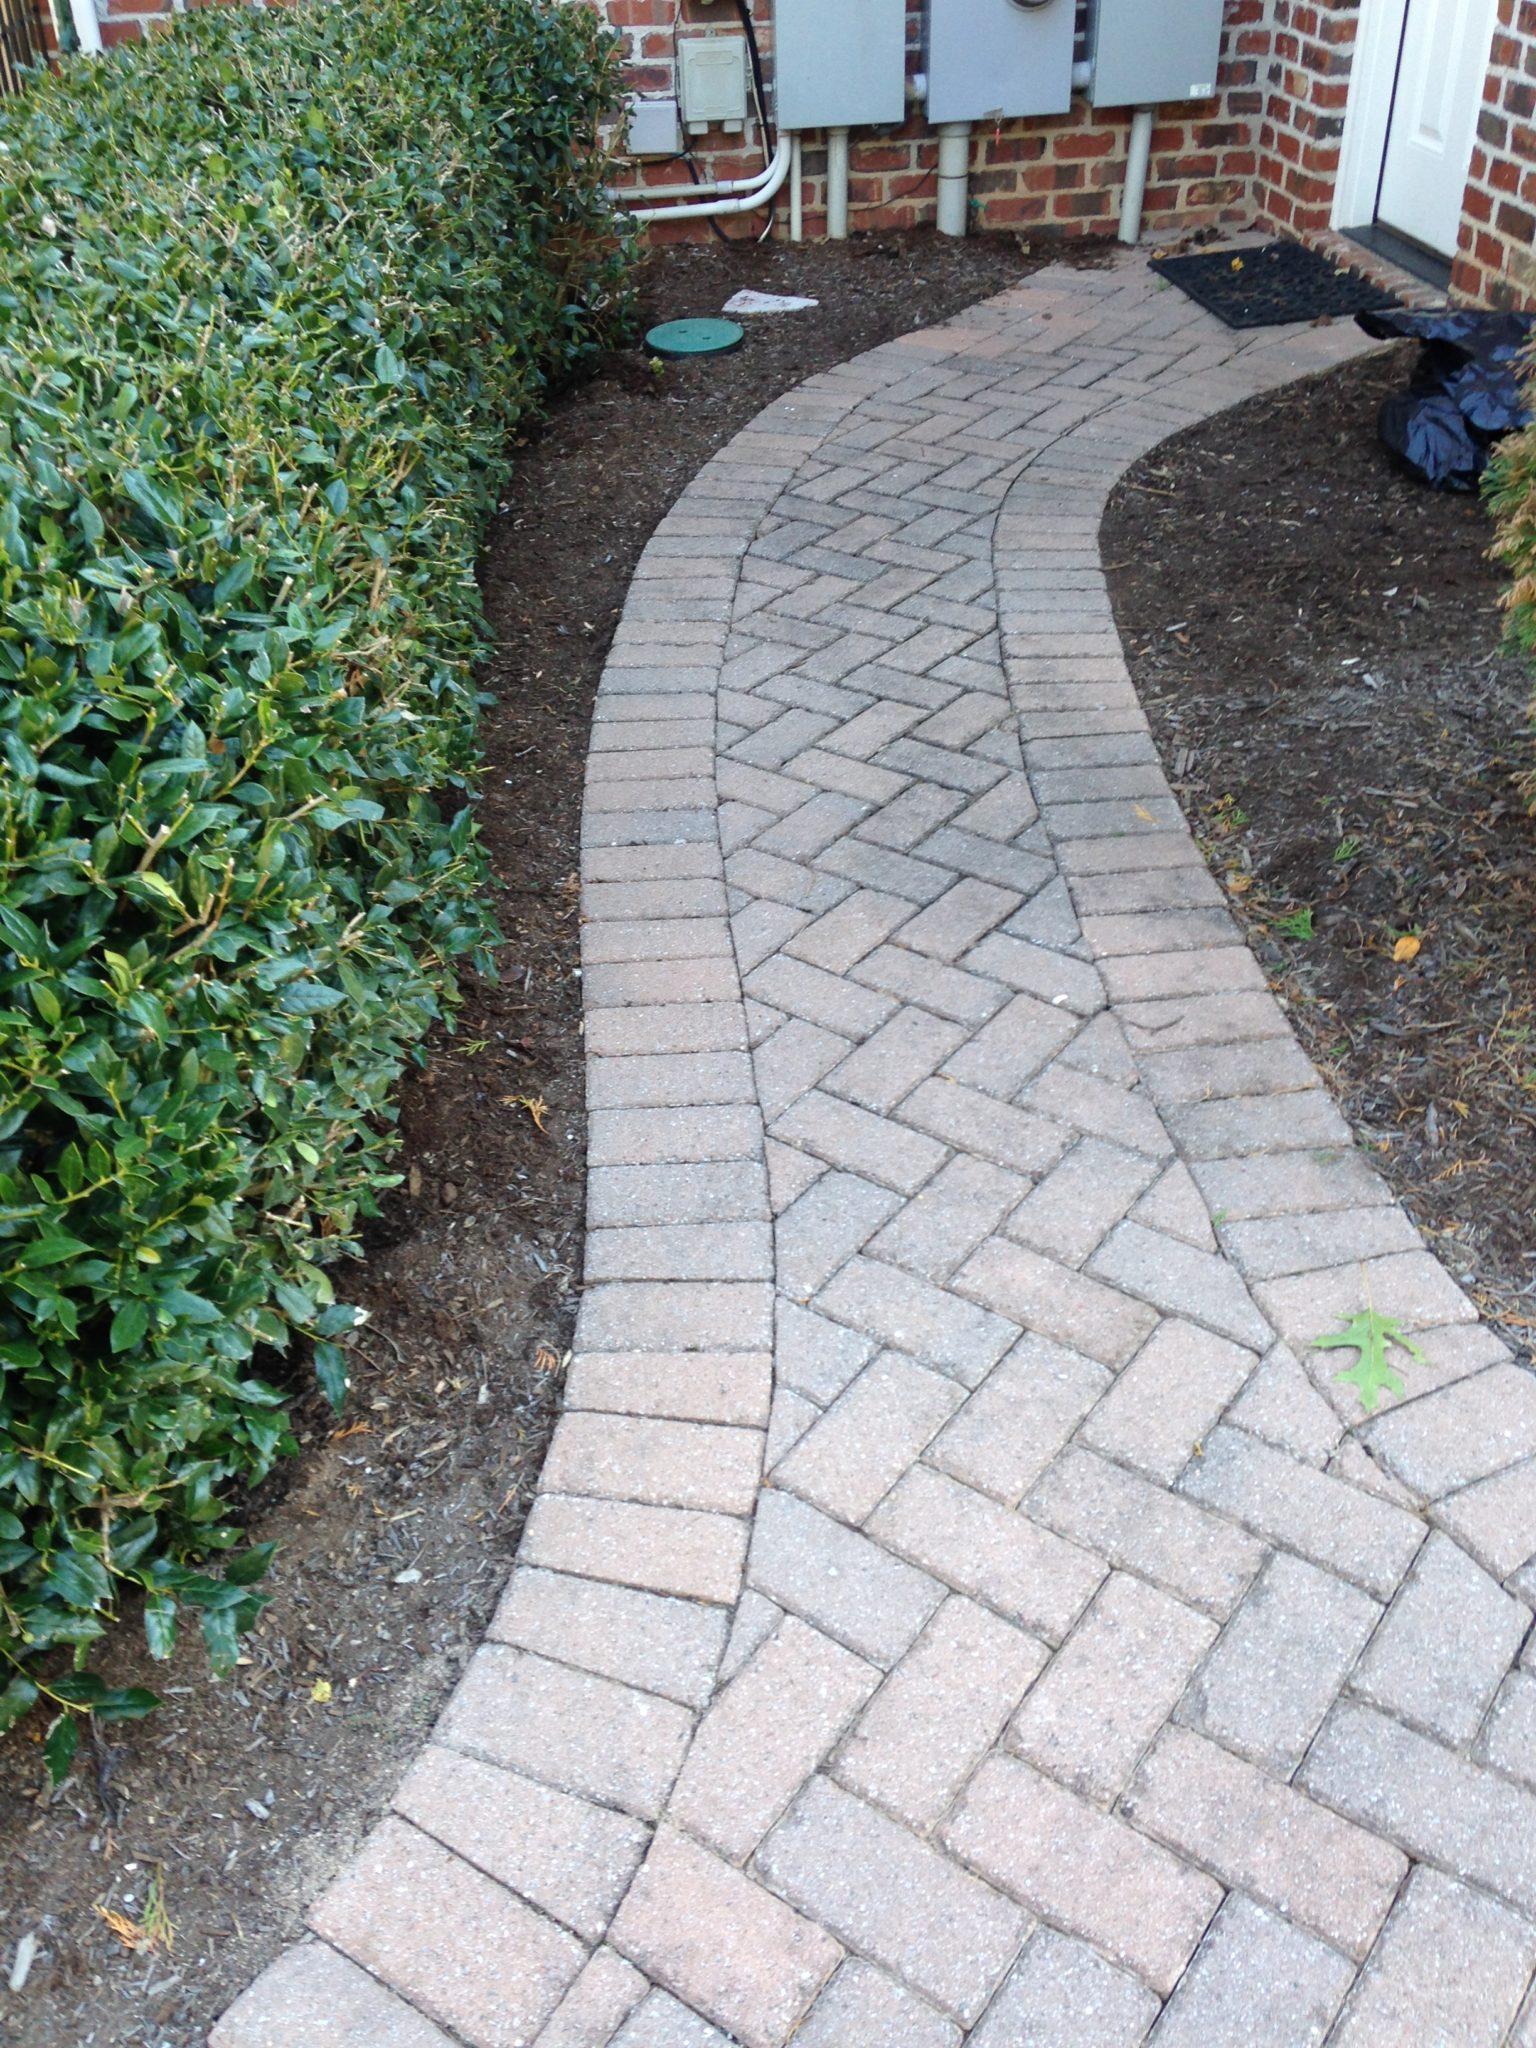 Raleigh Driveway Pavers Paving Stones